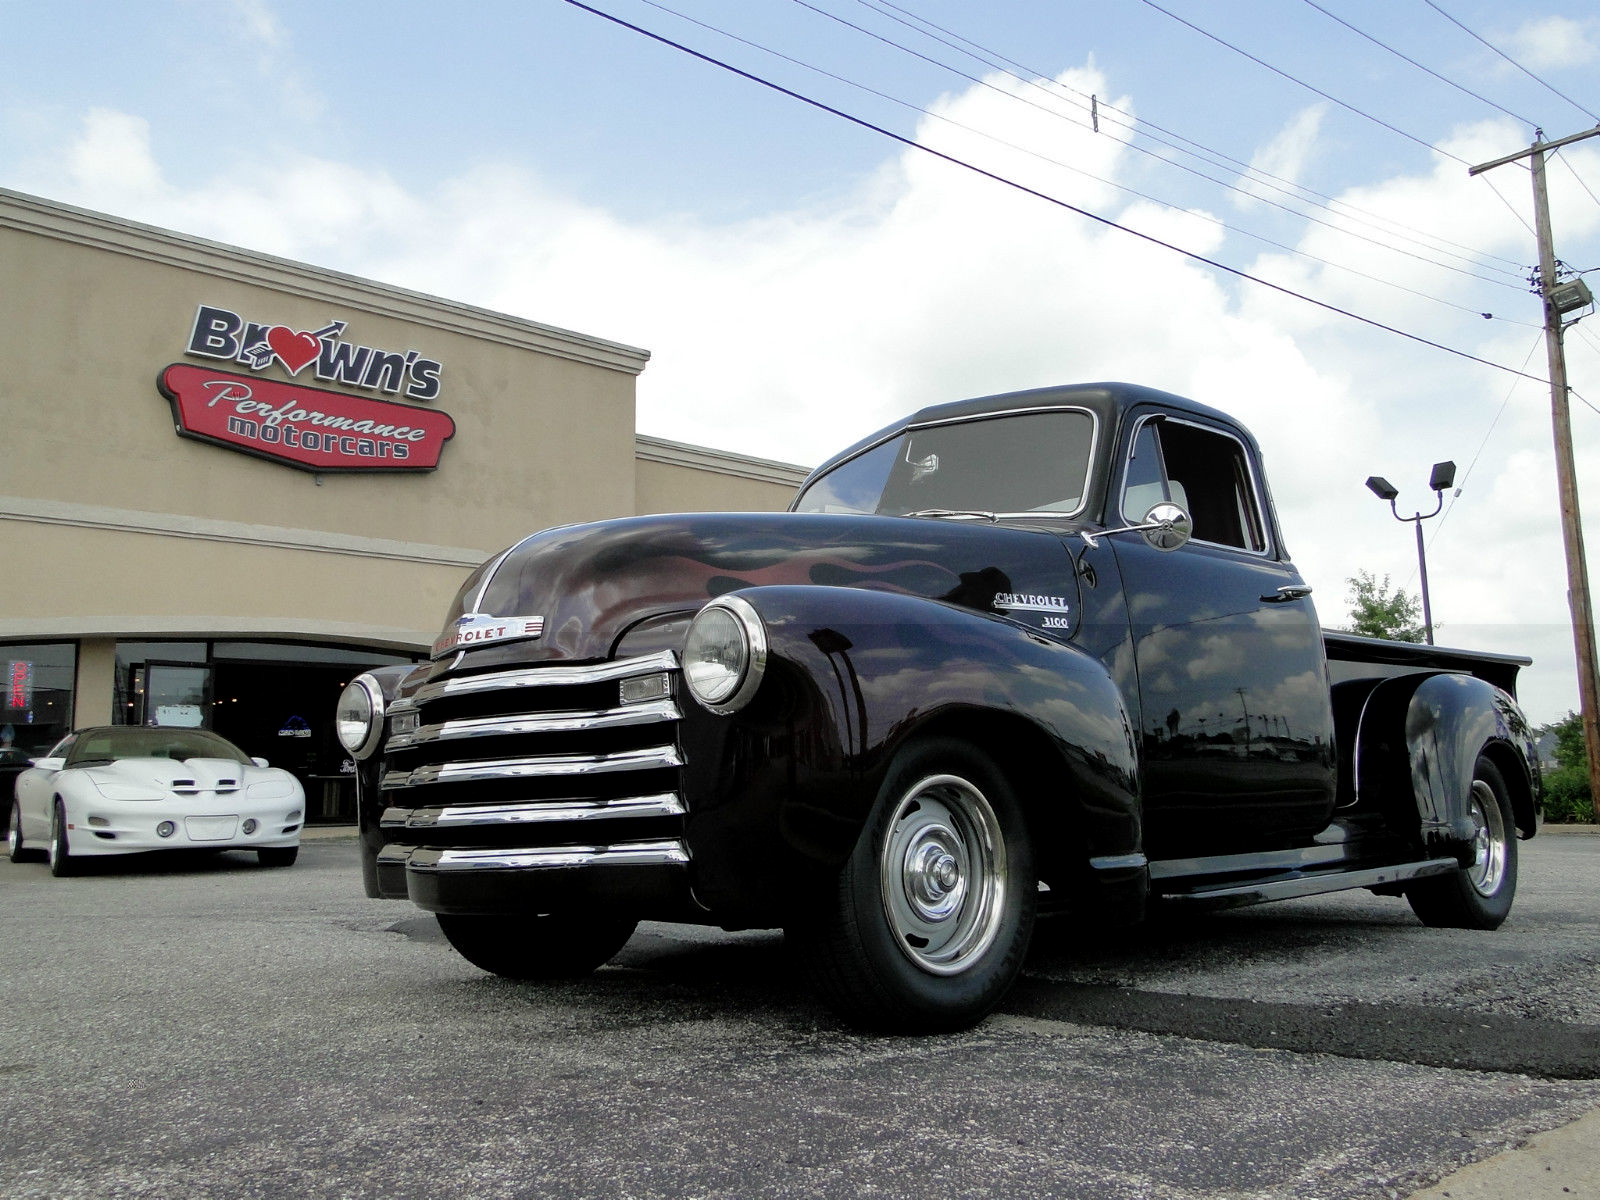 1951 Chevy 5 Window Black Cherry Pickup Truck For Sale In Glen Chevrolet Custom Hot Rod Other Pickups